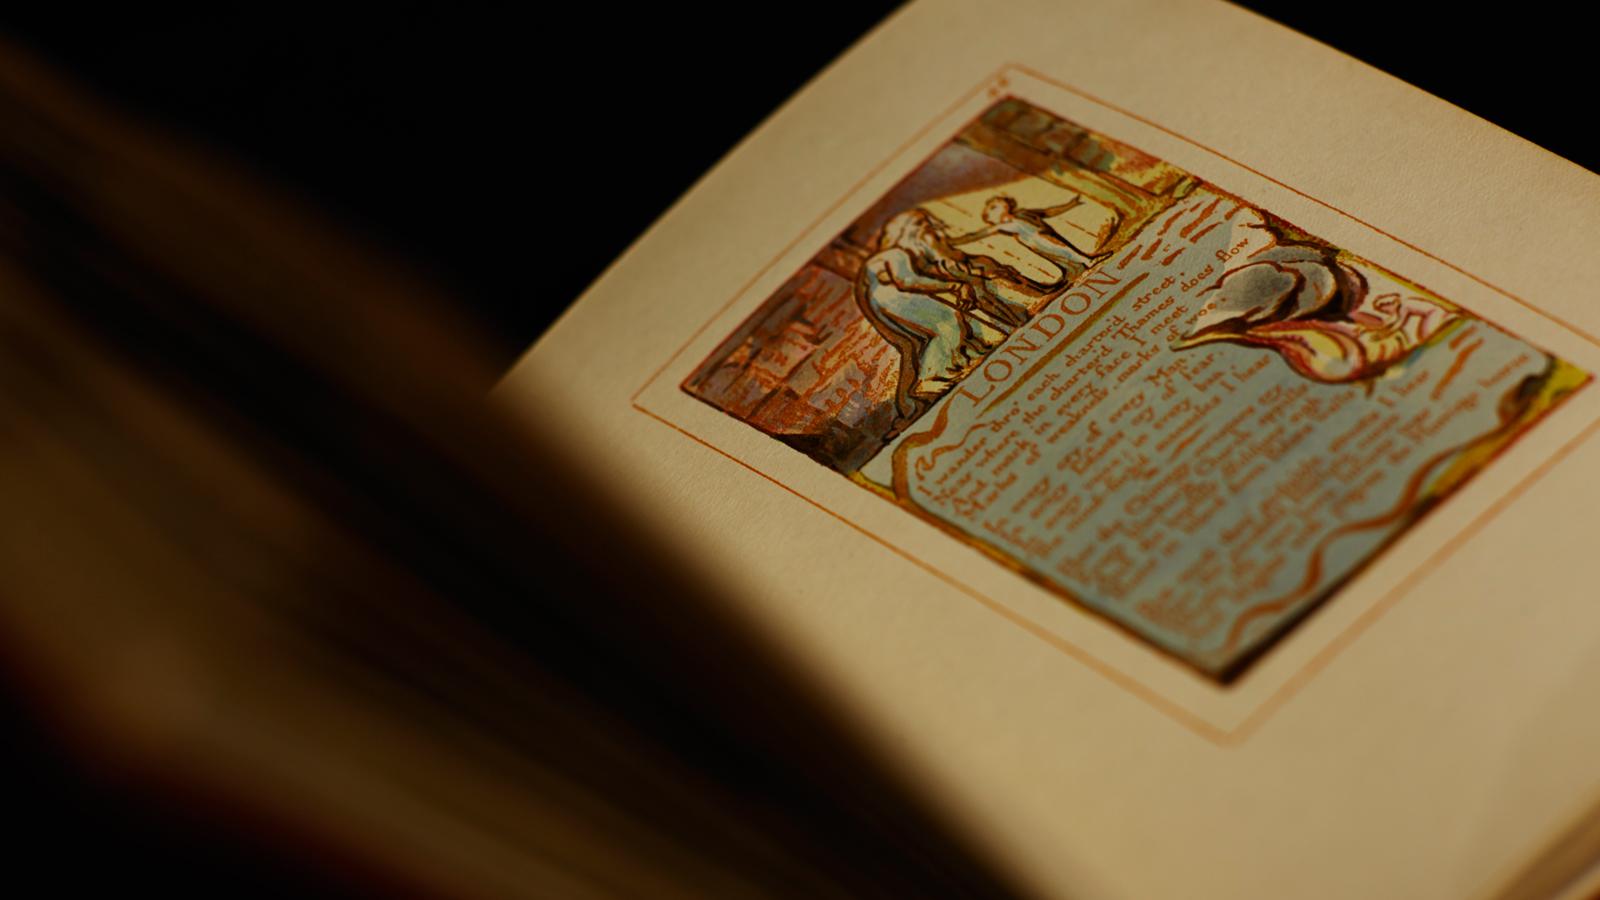 Looking at the manuscript of William Blake's 'London'